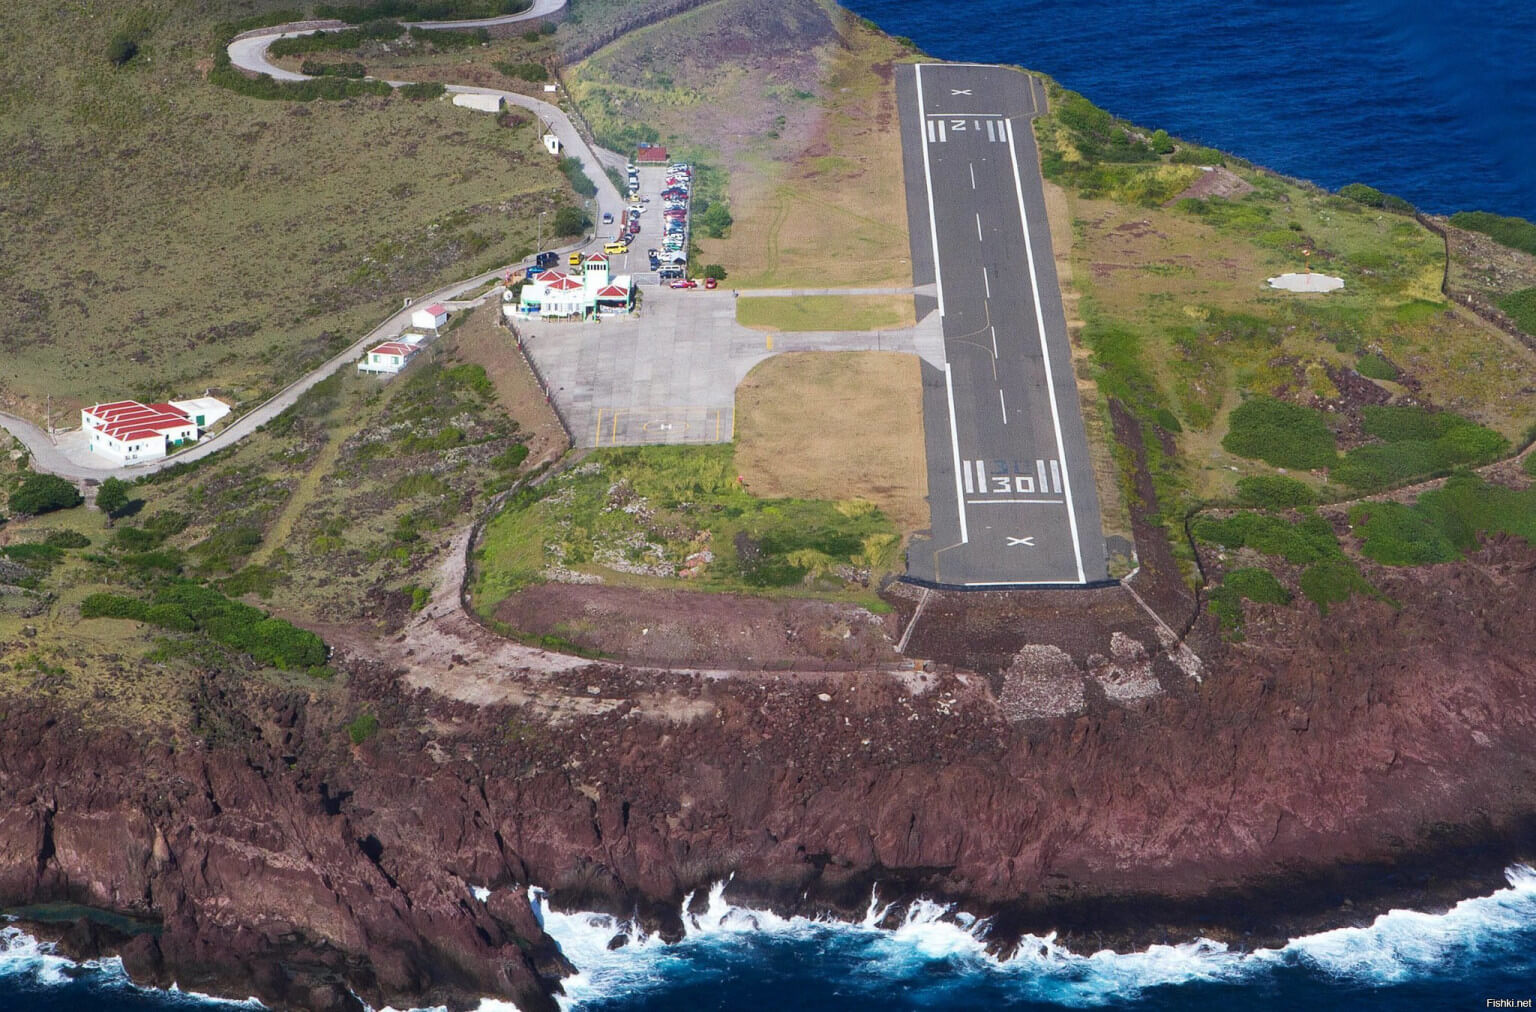 Juancho E Yrausquin Airport